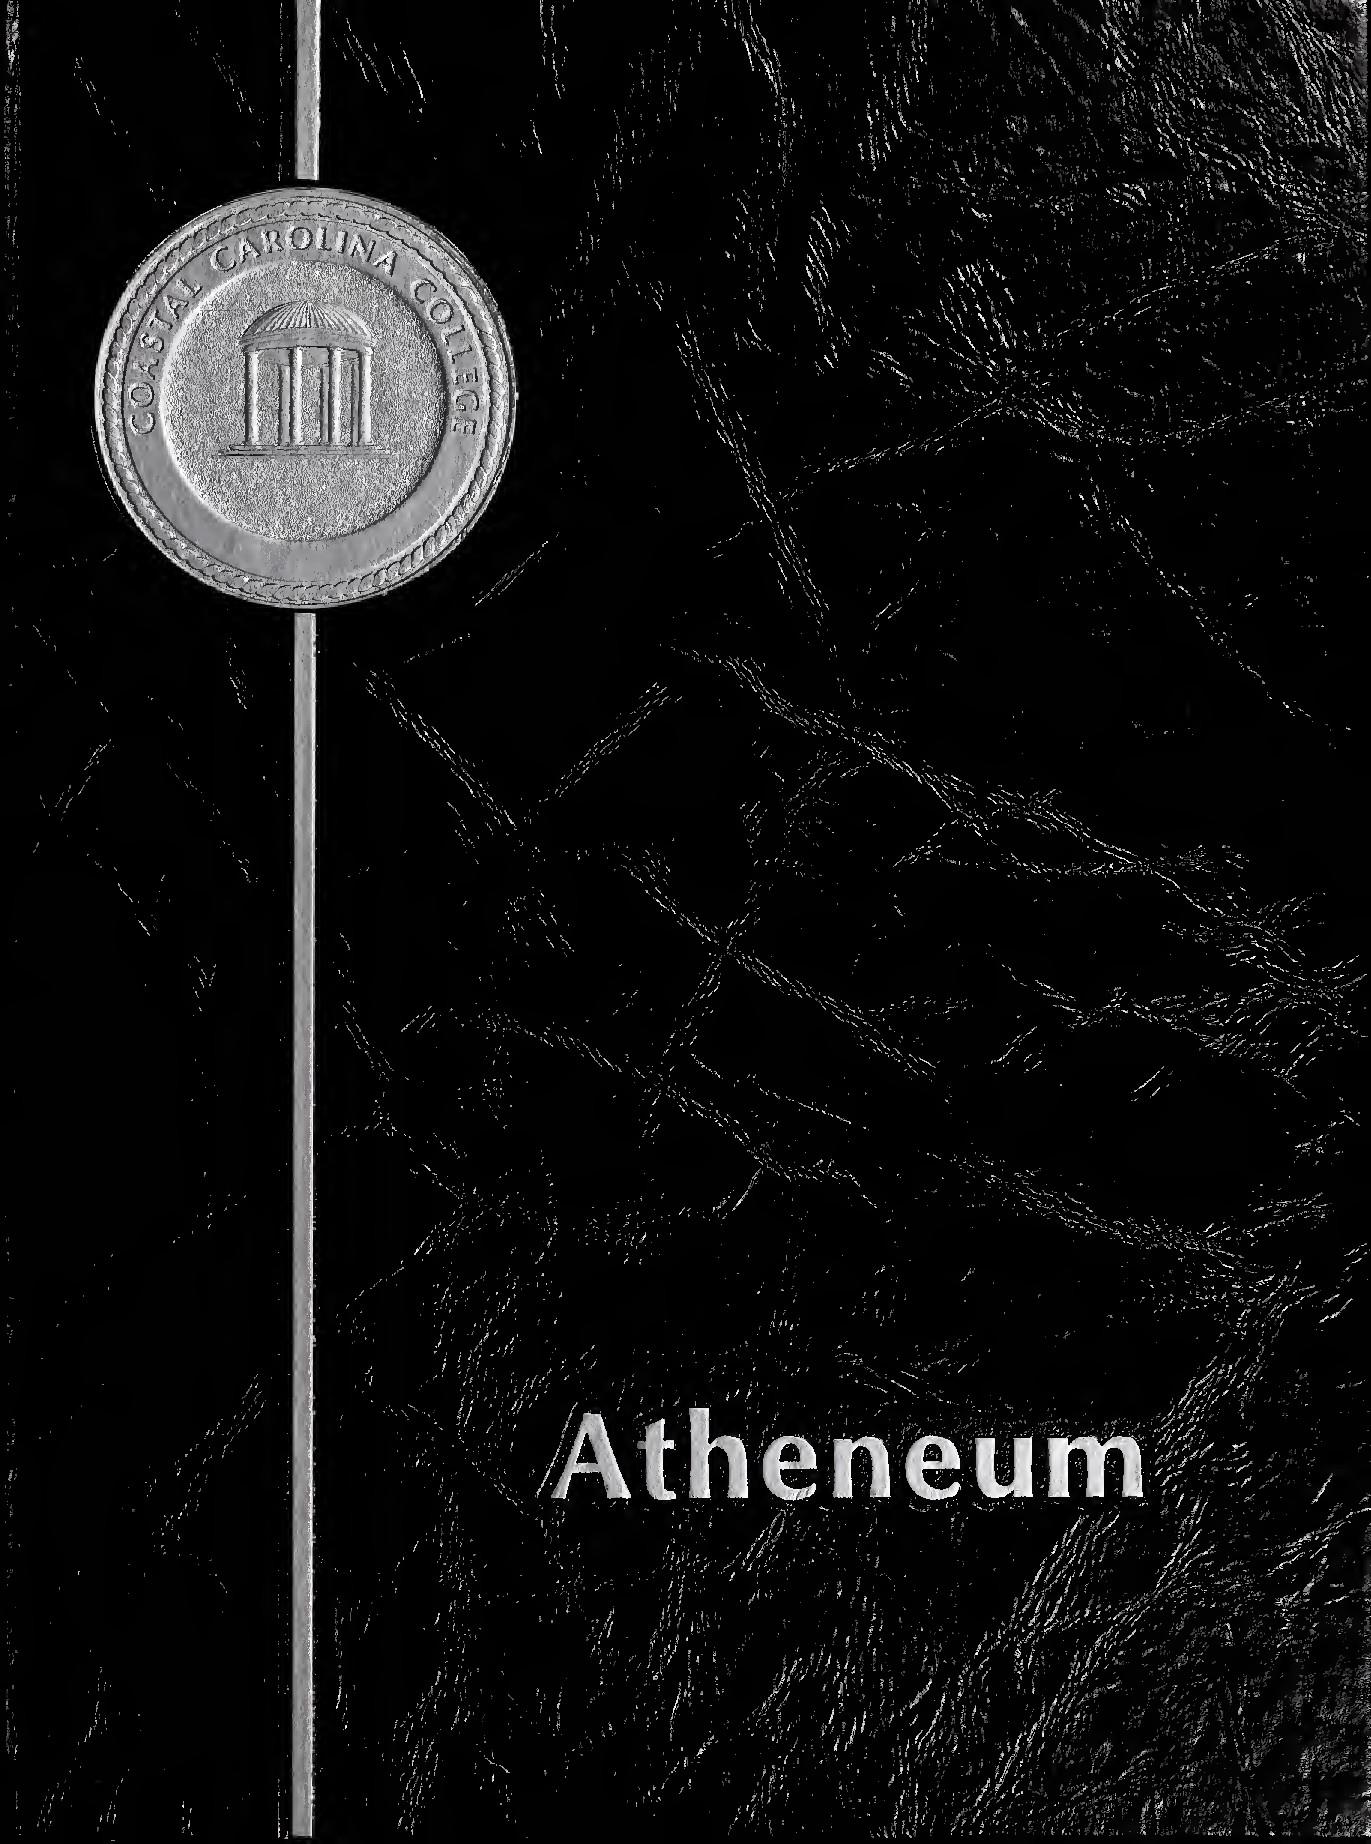 Atheneum, 1980-1981